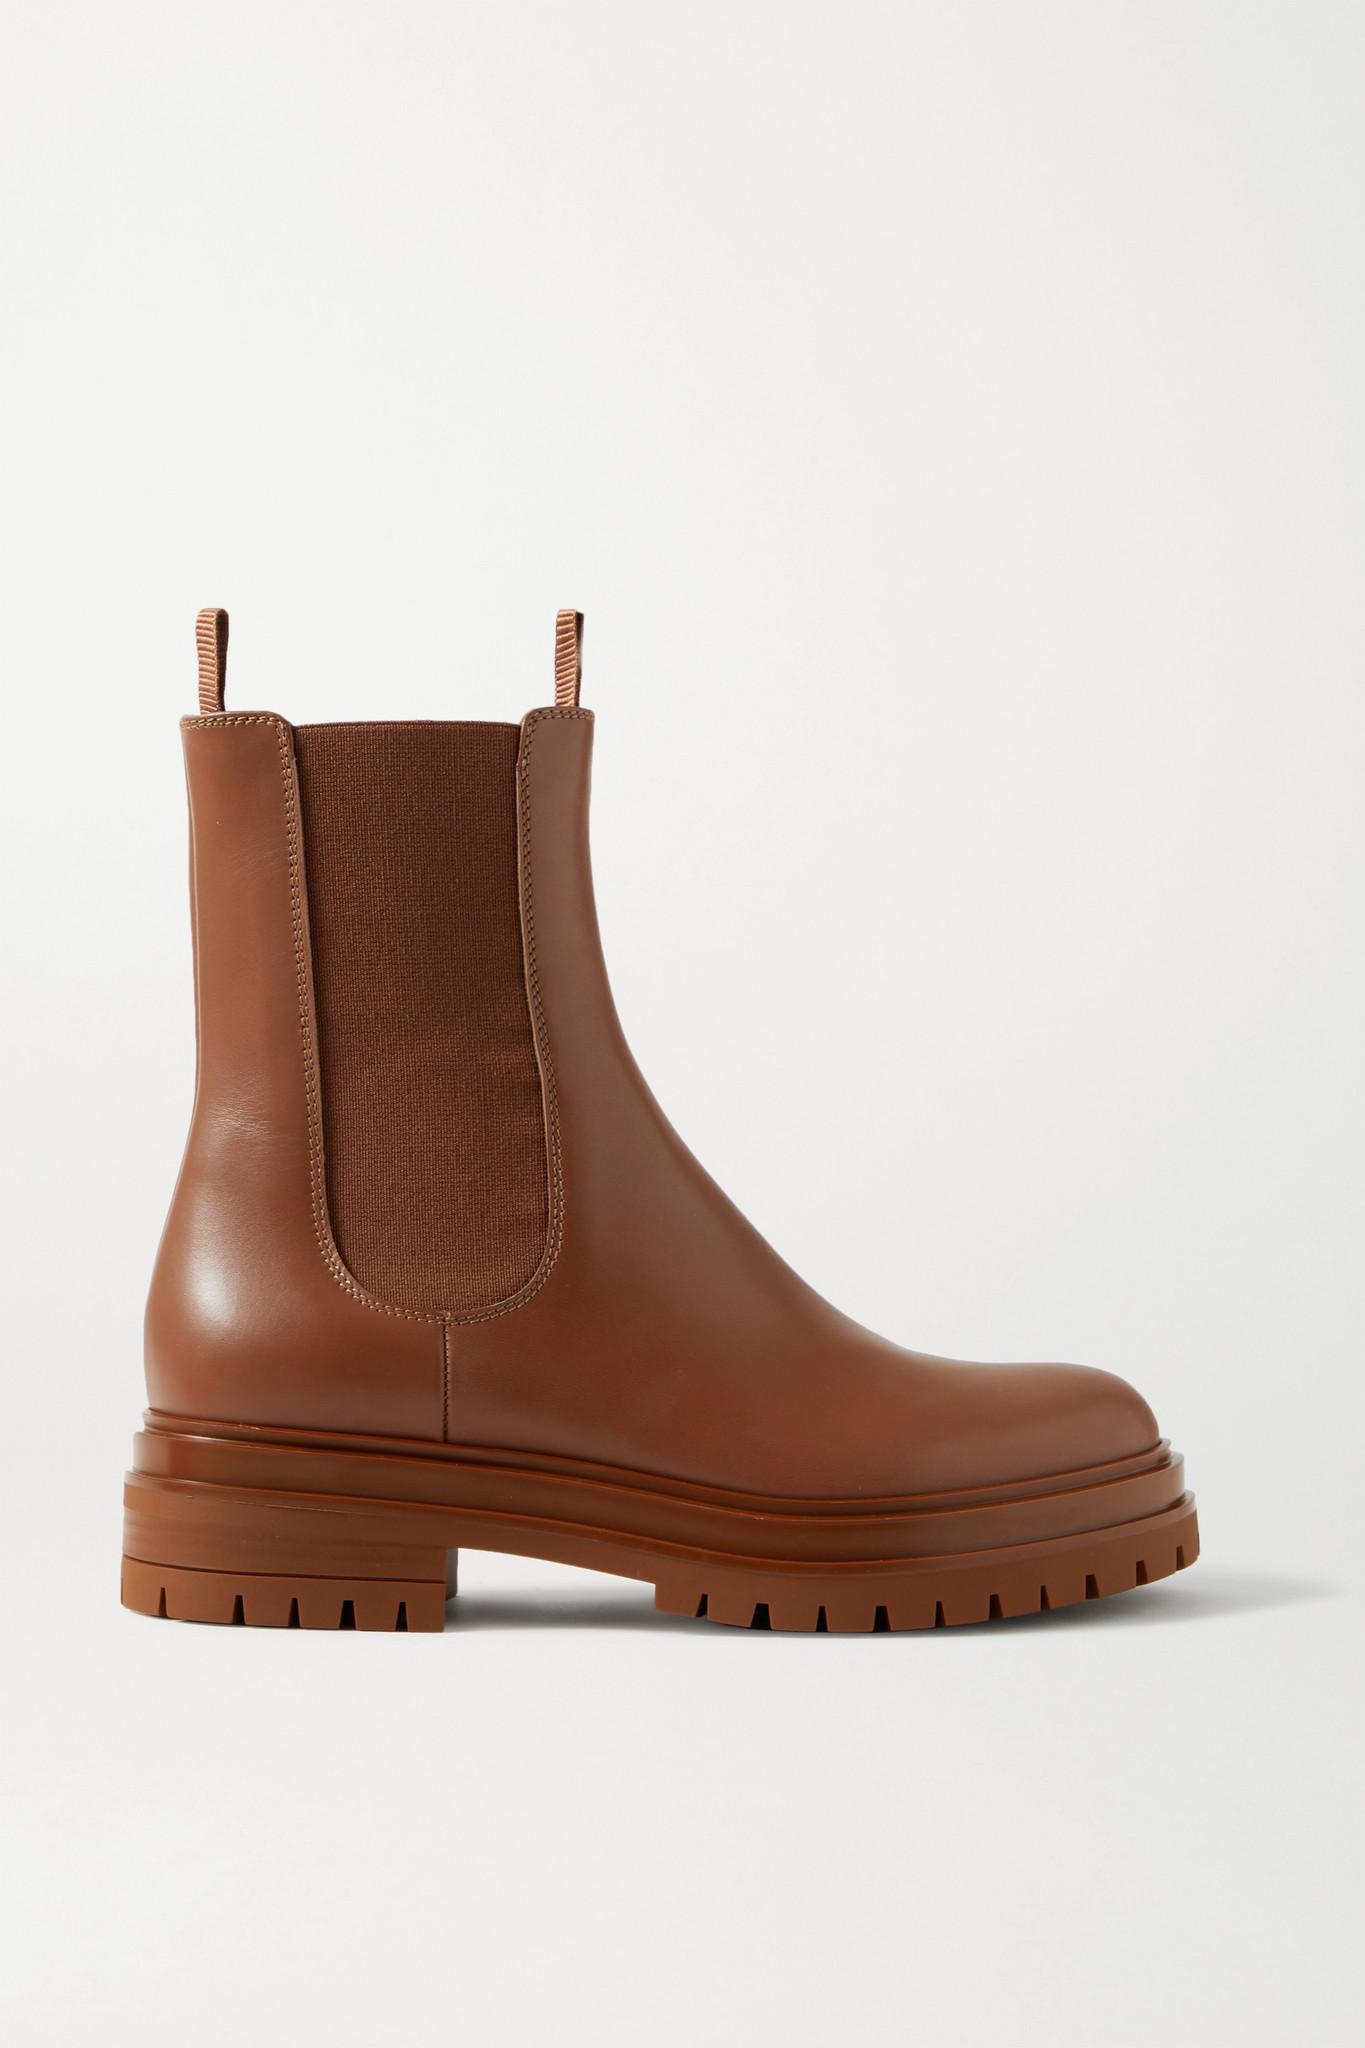 GIANVITO ROSSI - 皮革切尔西靴 - 棕色 - IT36.5